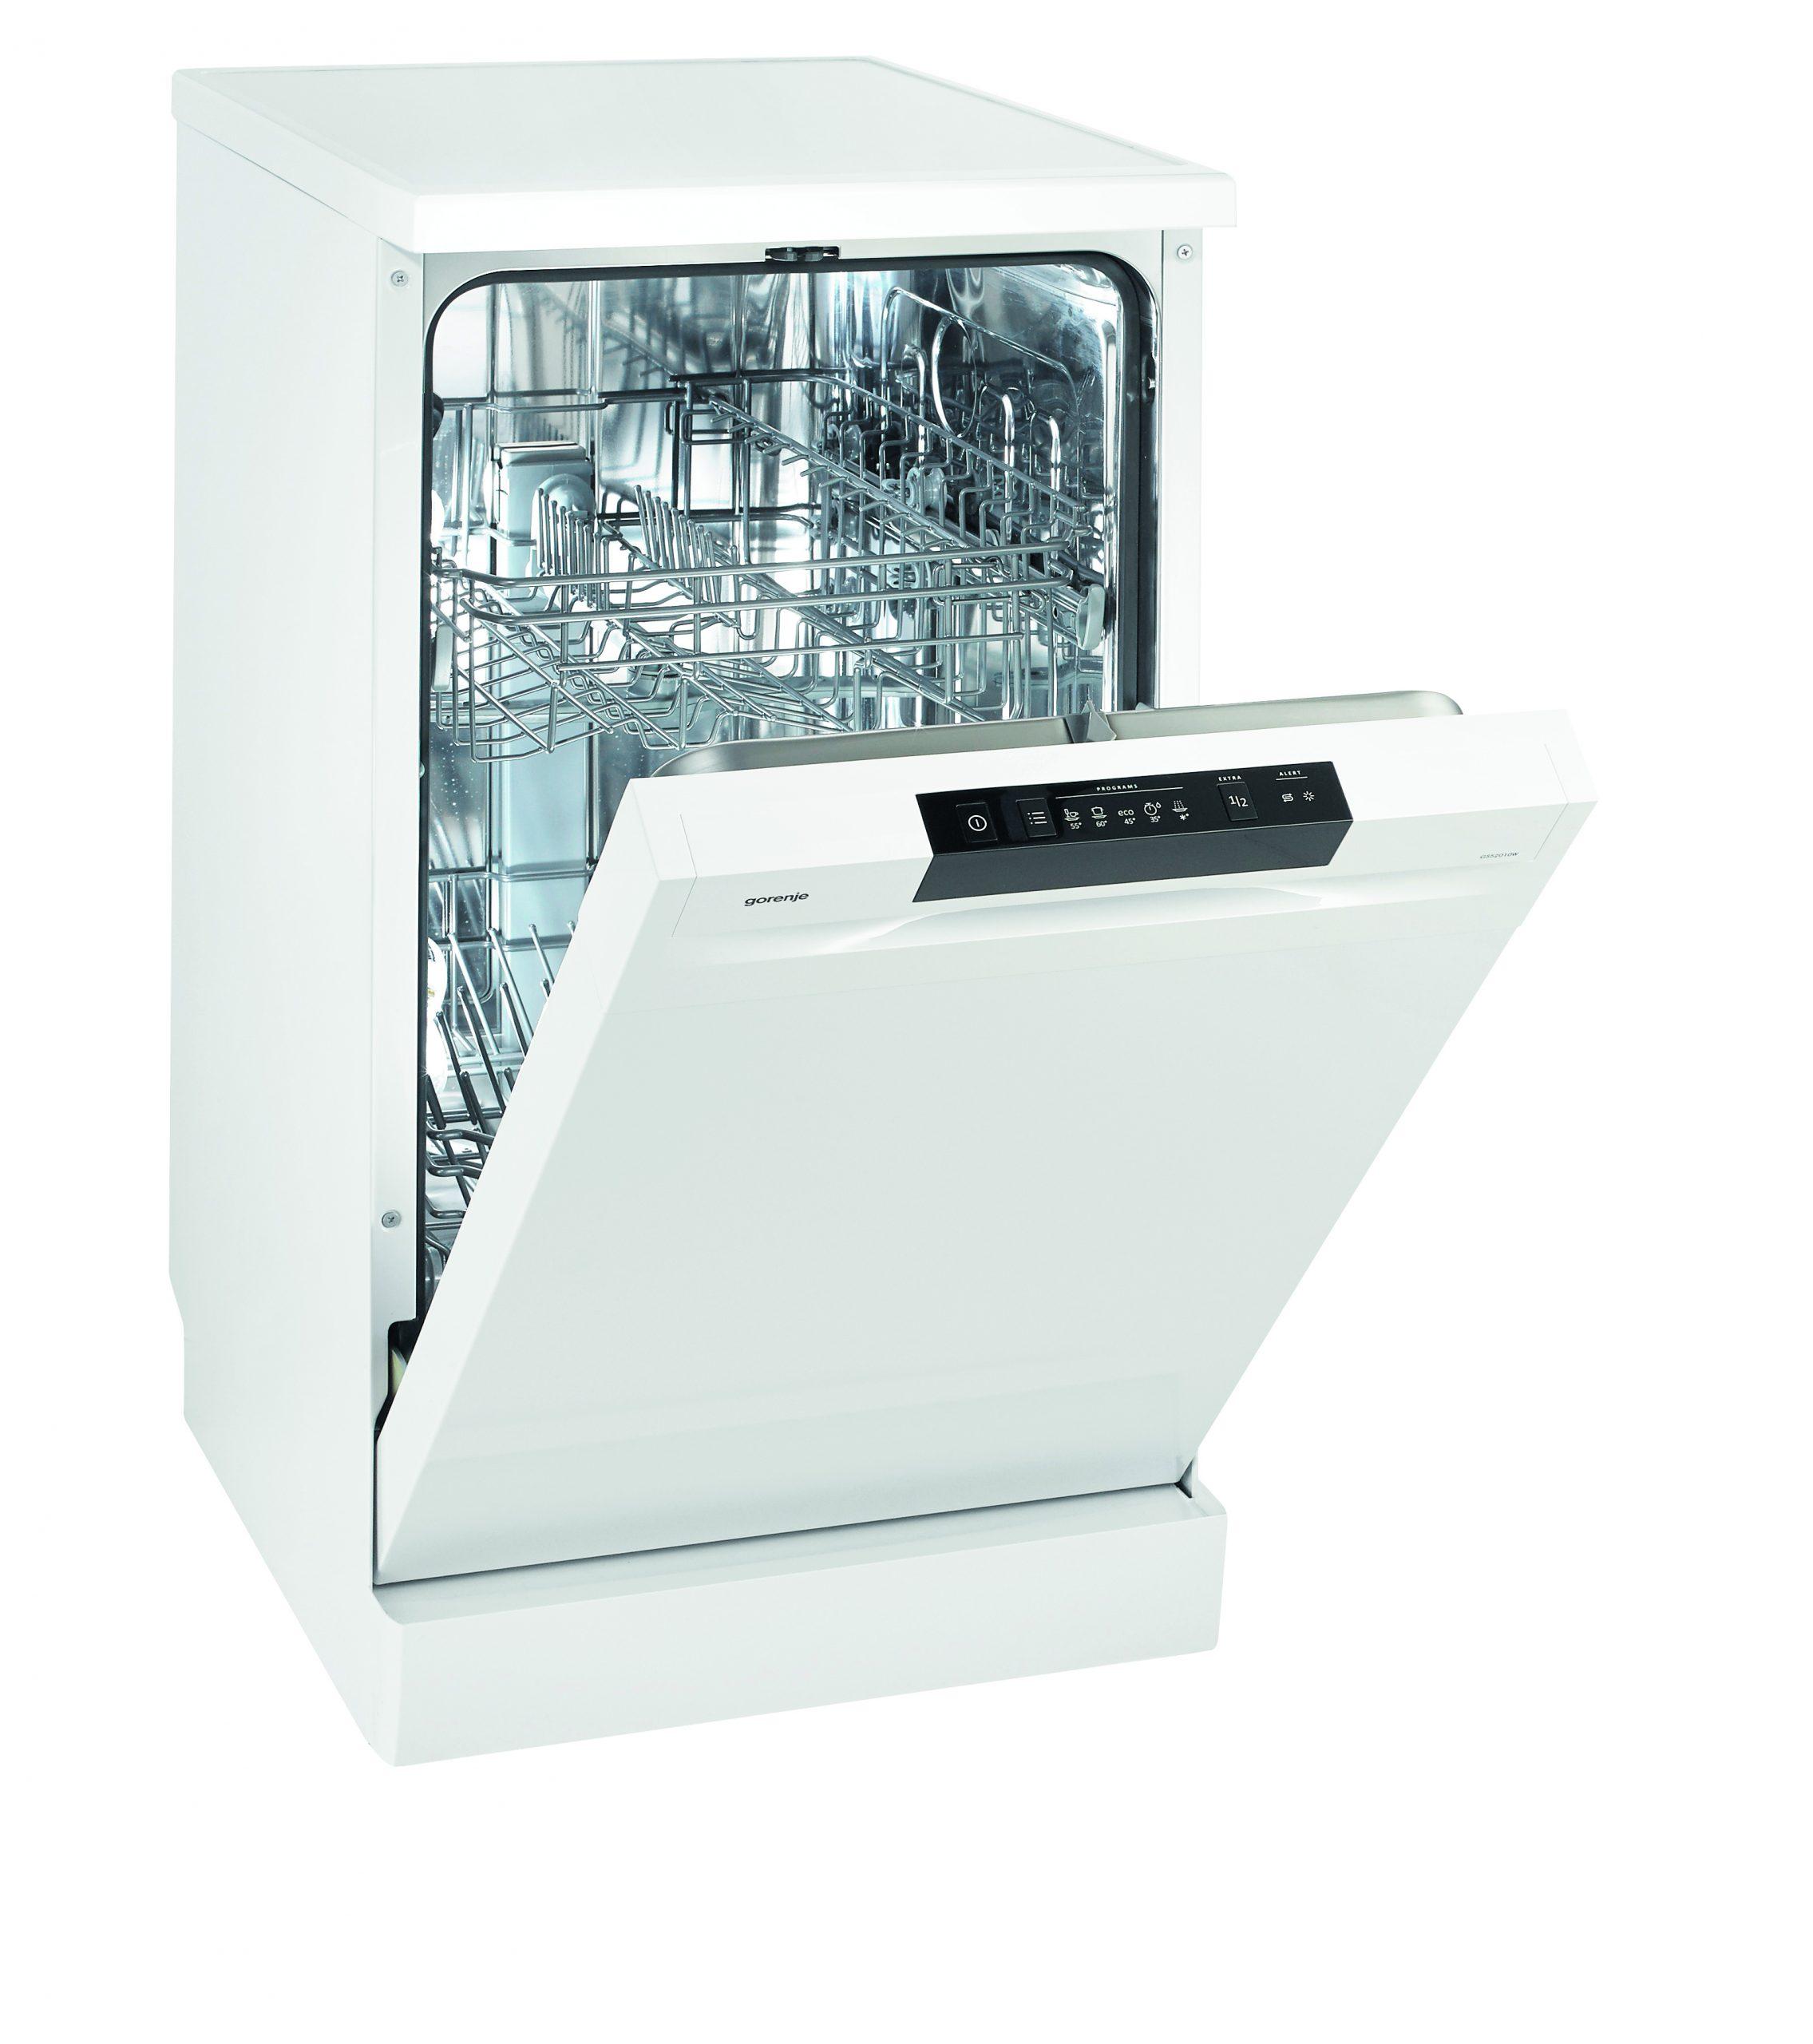 Посудомоечная машина Gorenje GS52010W 56692190633048 - 3